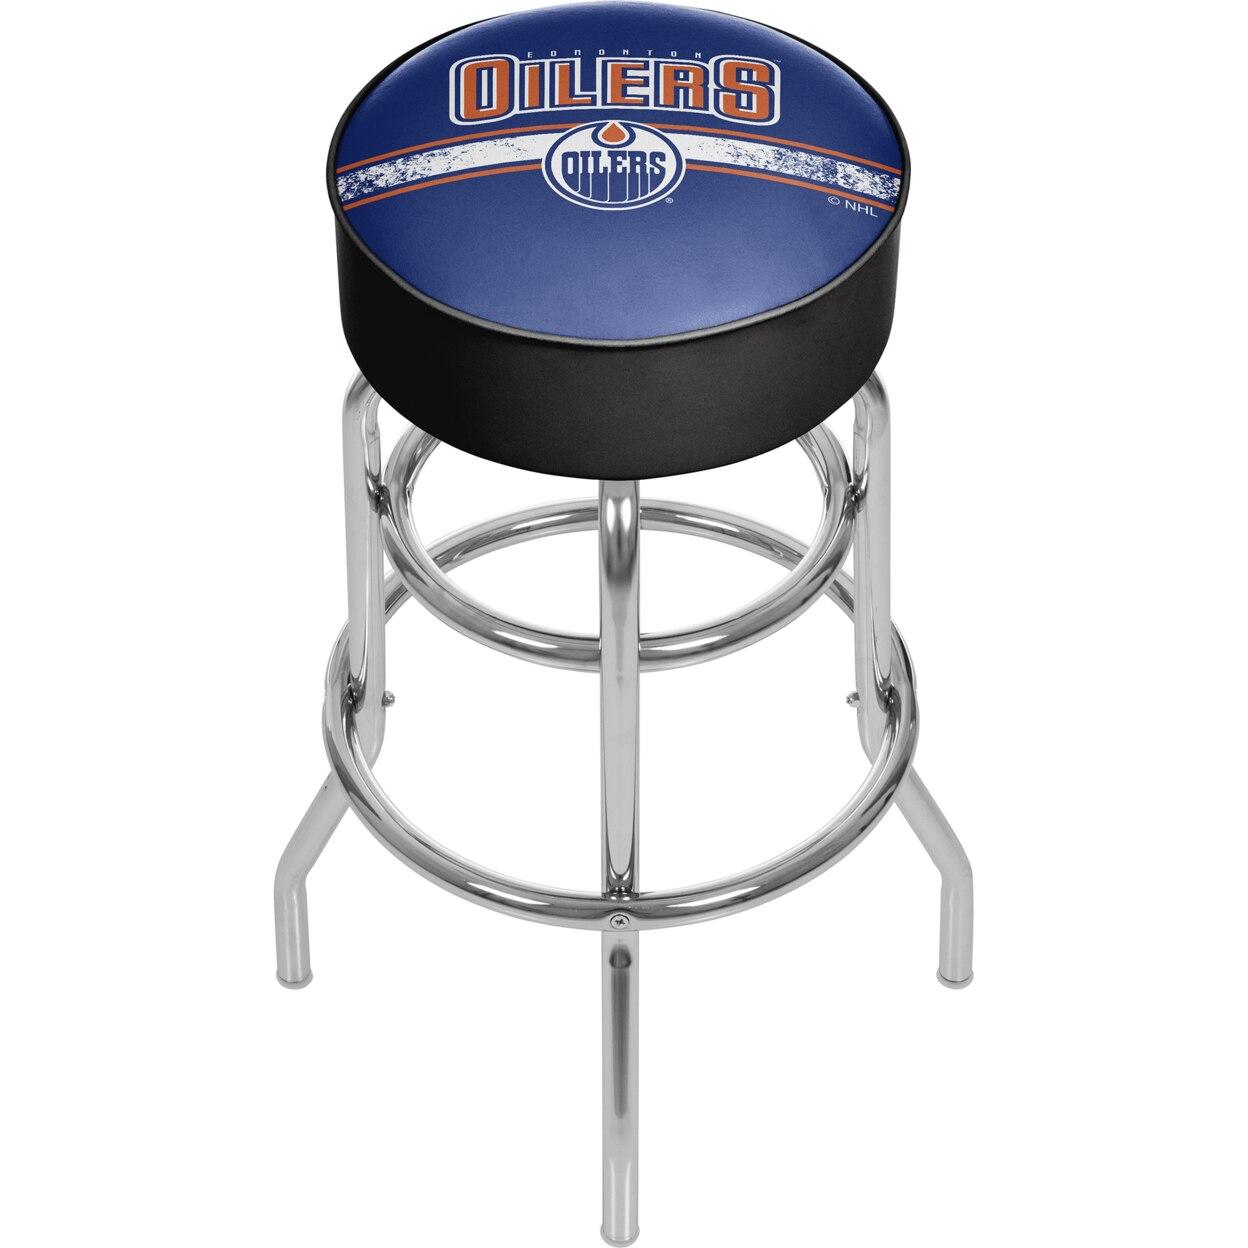 NHL Chrome Padded Swivel Bar Stool 30 Inches High - Edmonton Oilers худи print bar edmonton oilers